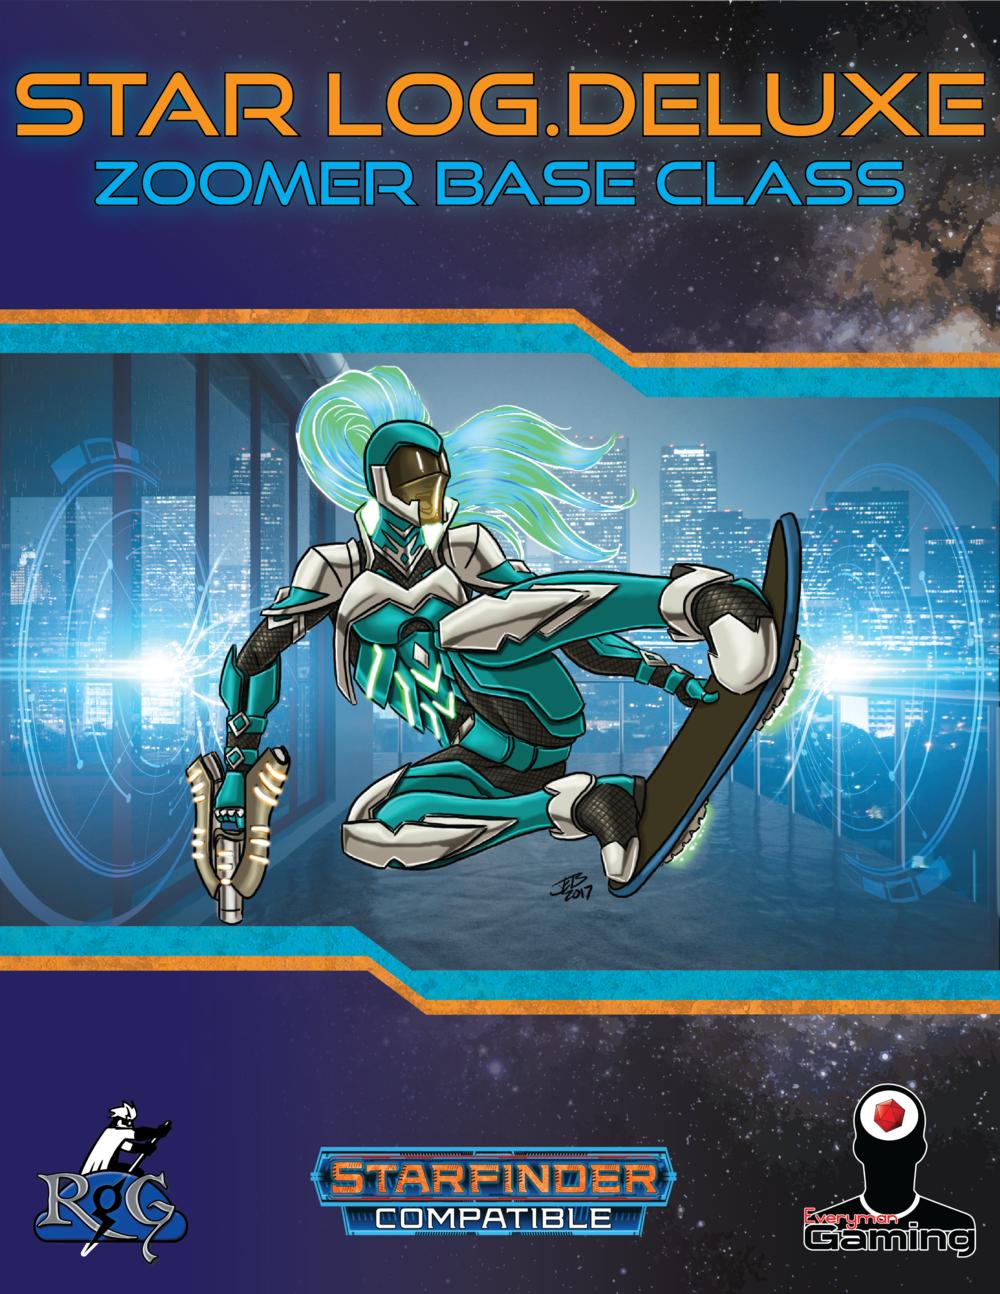 SLDX003 Zoomer.png